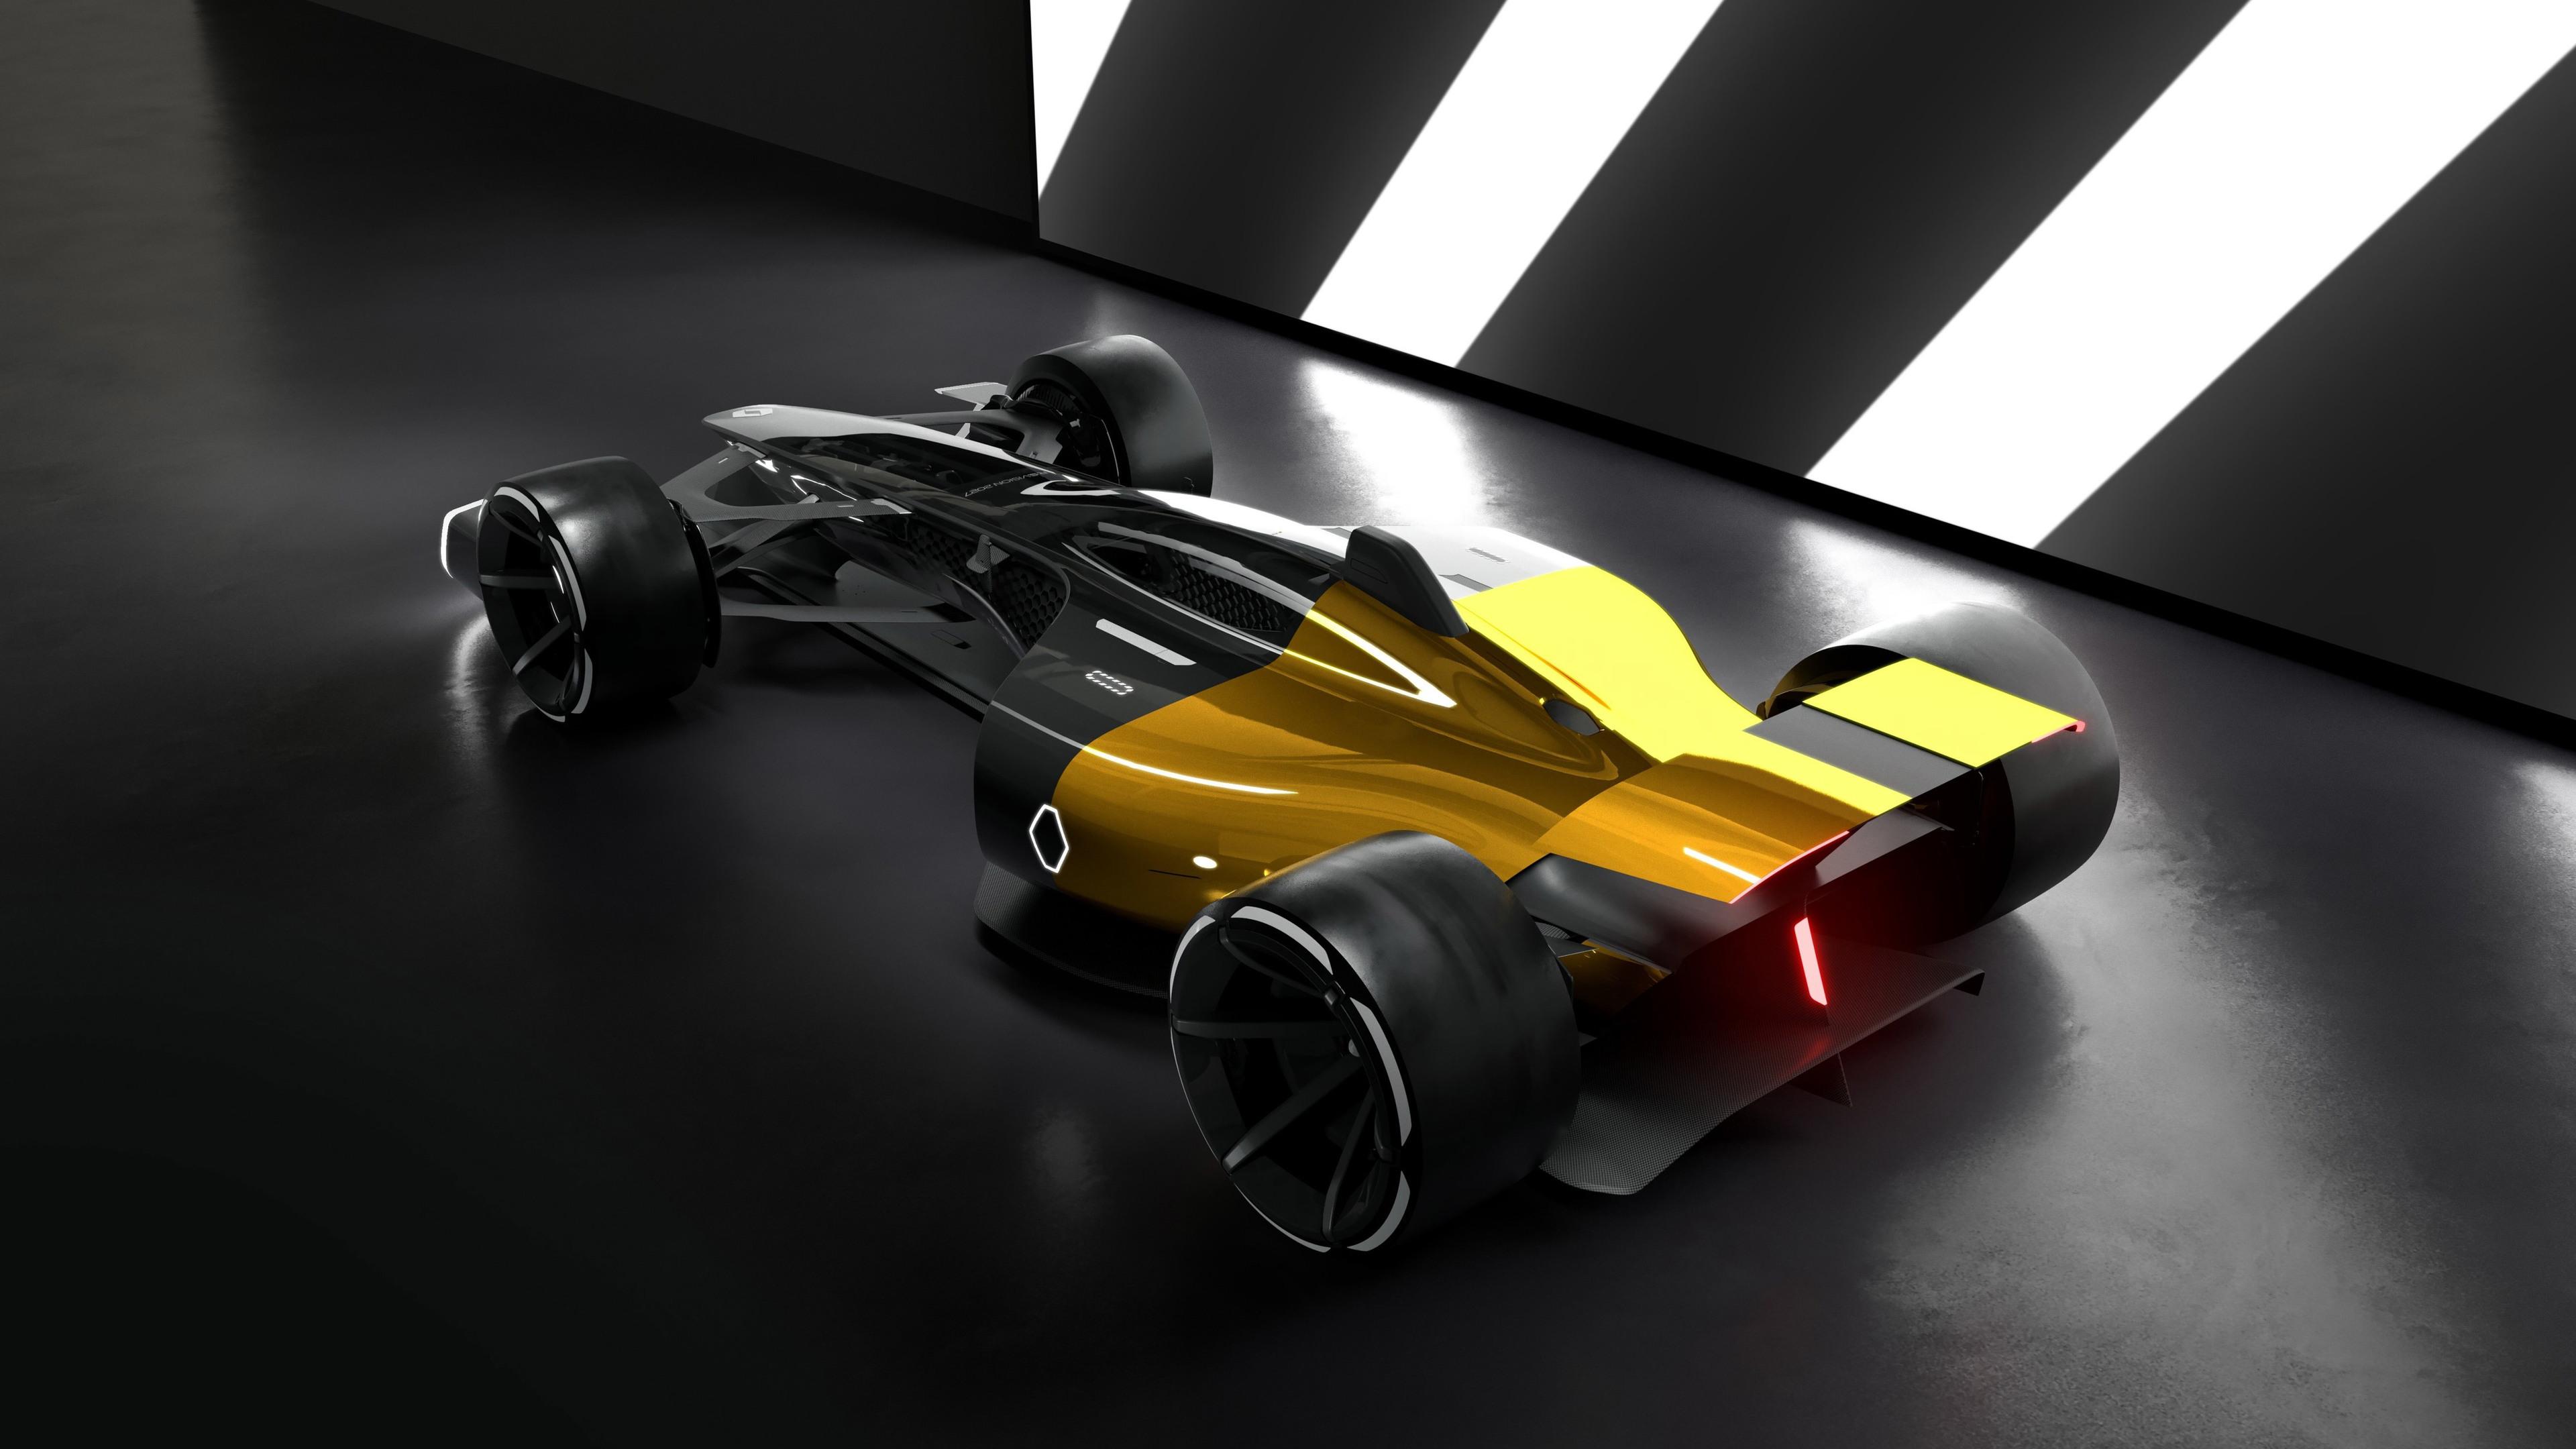 renault rs 2027 vision concept car 1539105223 - Renault RS 2027 Vision Concept Car - renault wallpapers, renault rs 2027 vision wallpapers, hd-wallpapers, concept cars wallpapers, 4k-wallpapers, 2017 cars wallpapers